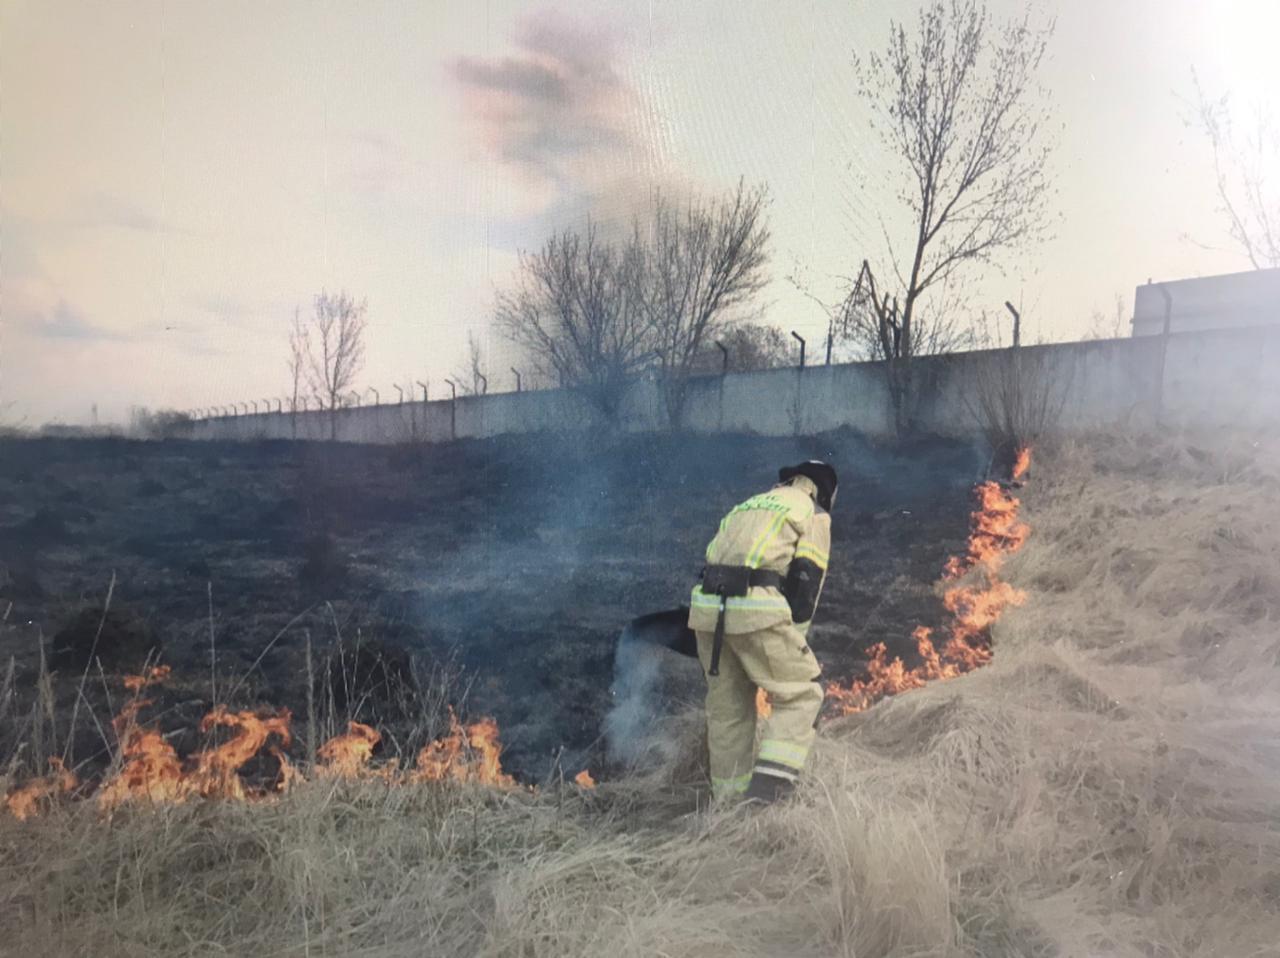 За сутки в Курской области произошло 8 возгораний сухостоя